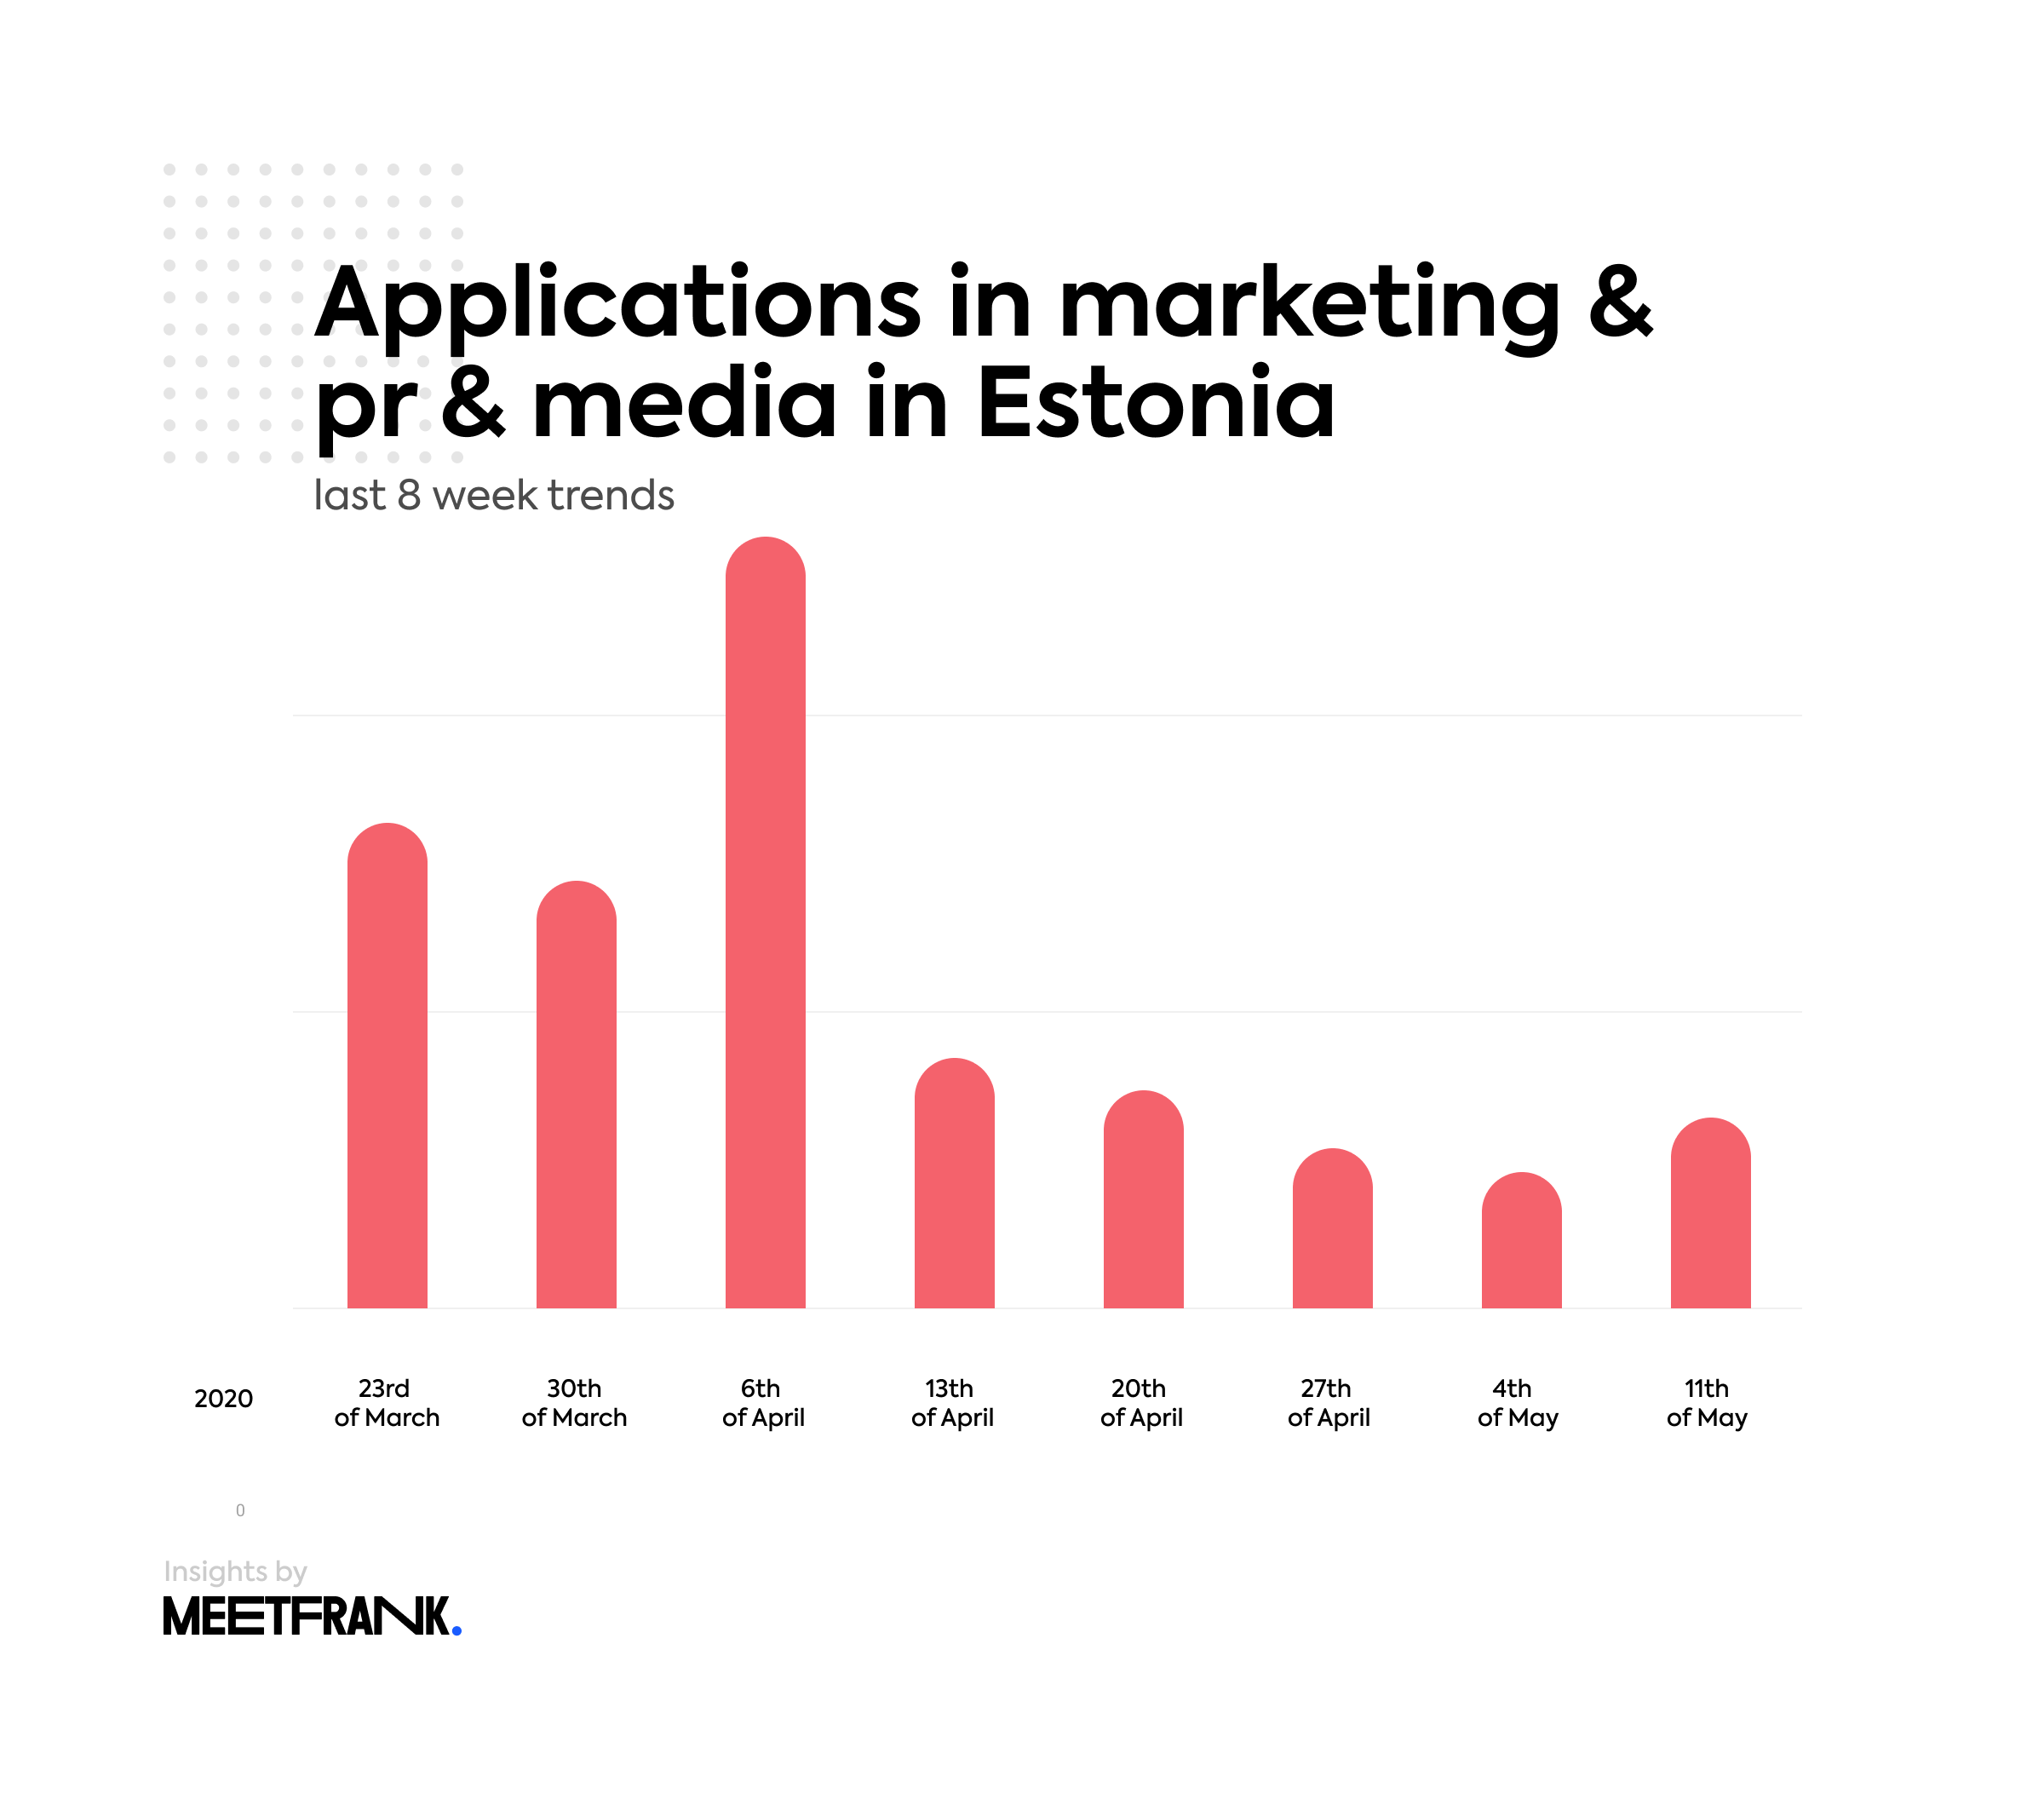 applications in marketing pr media in Estonia